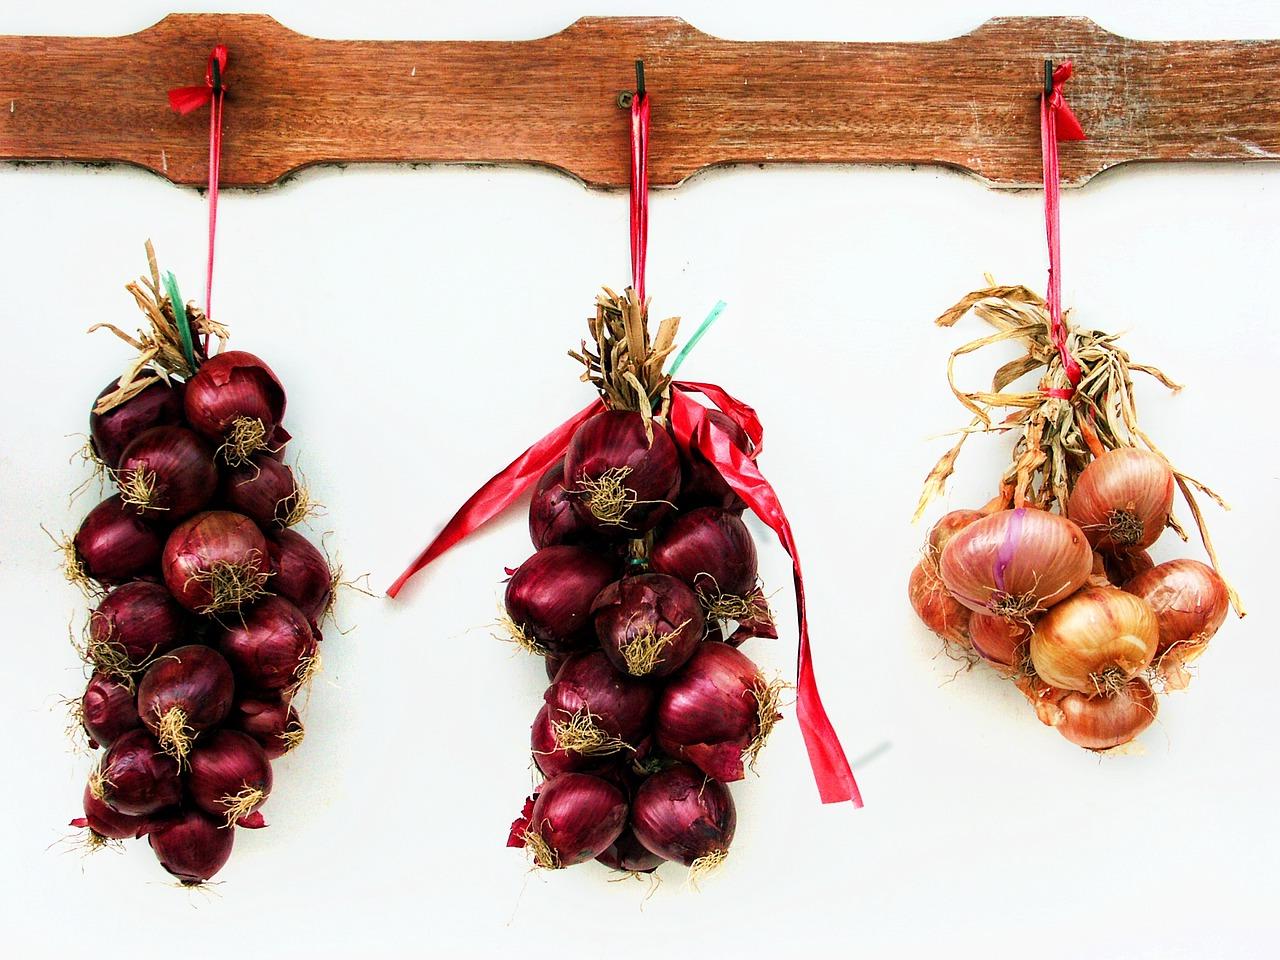 onions-748419_1280